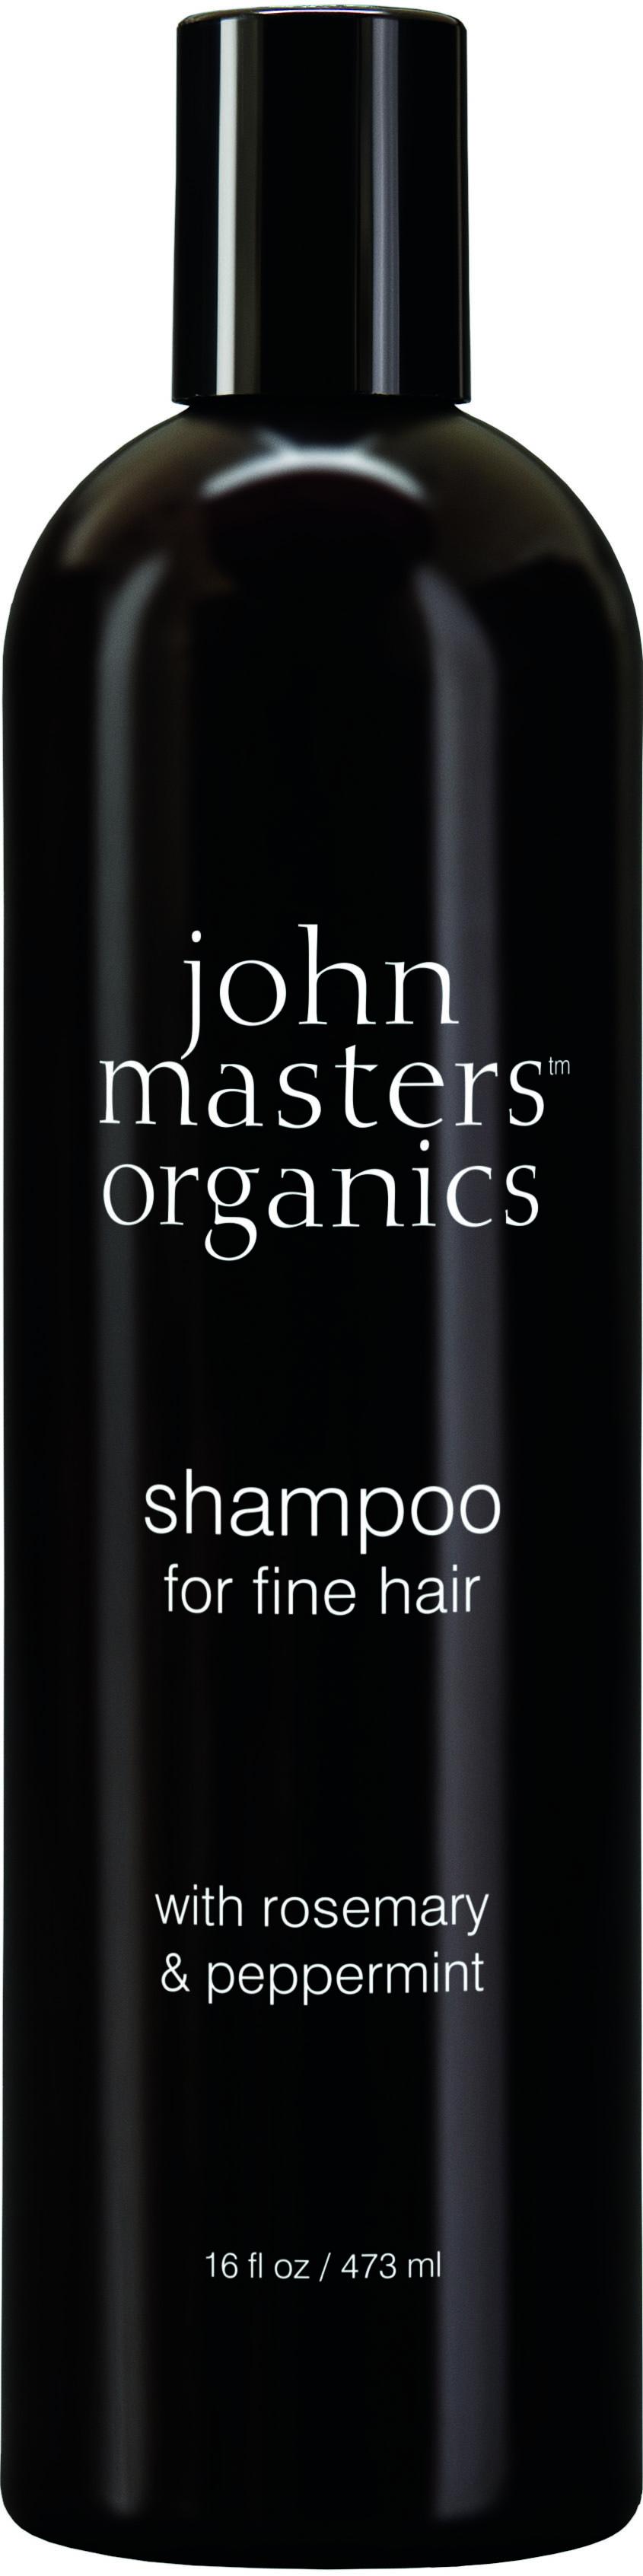 John Masters Organics - Shampoo for Fine Hair w. Rosemary & Peppermint 473 ml